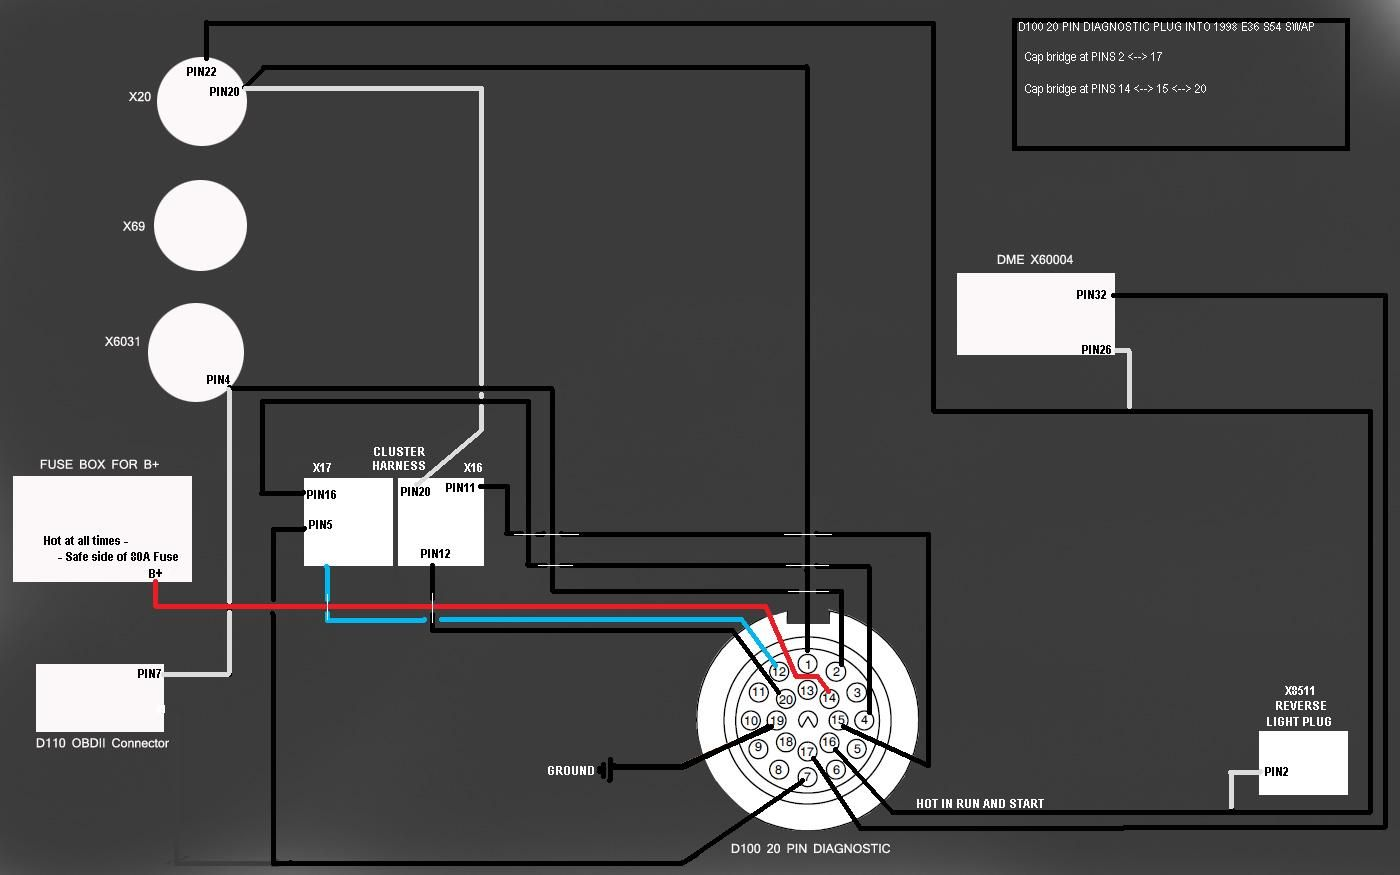 72b155b4daf0ec15a367426d247f96d8 s54 in e36 m3, my turn page 4 m3 pinterest